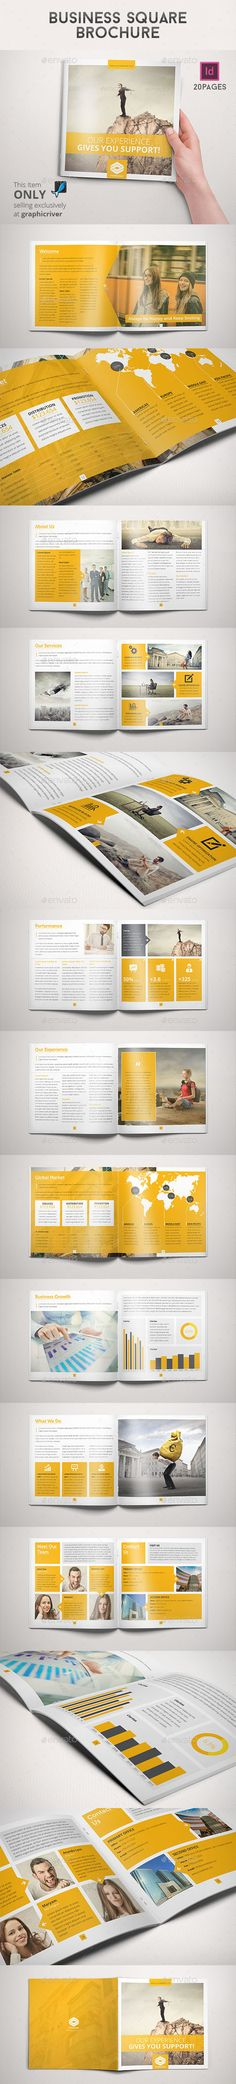 Business Square Brochure - Corporate Brochures